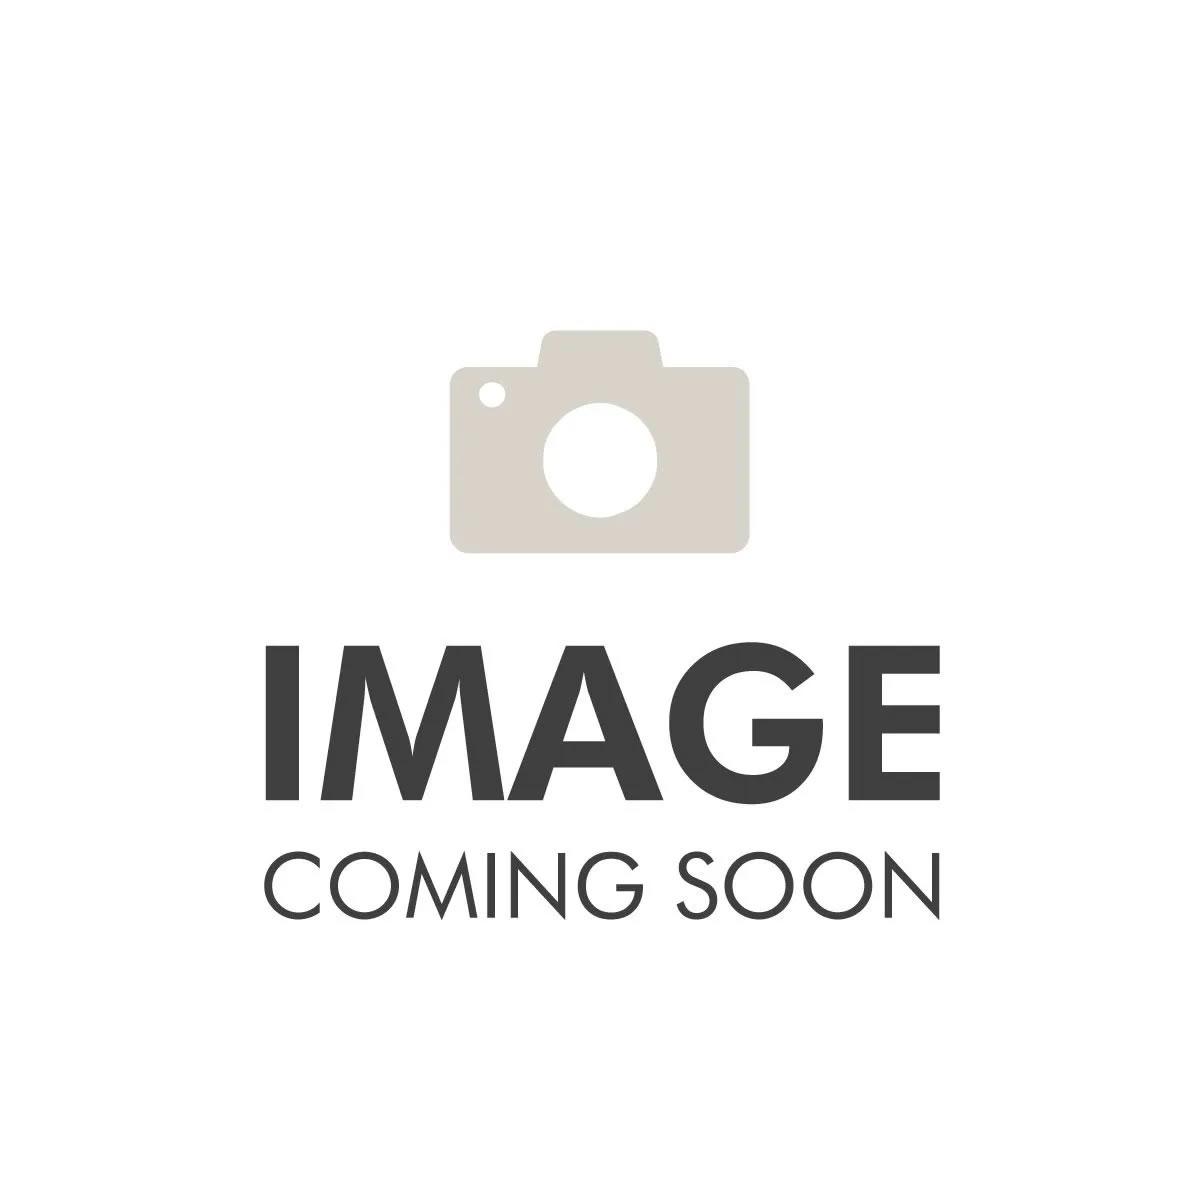 Piston Ring Set, .060, 134CI; 41-71 Willys Models